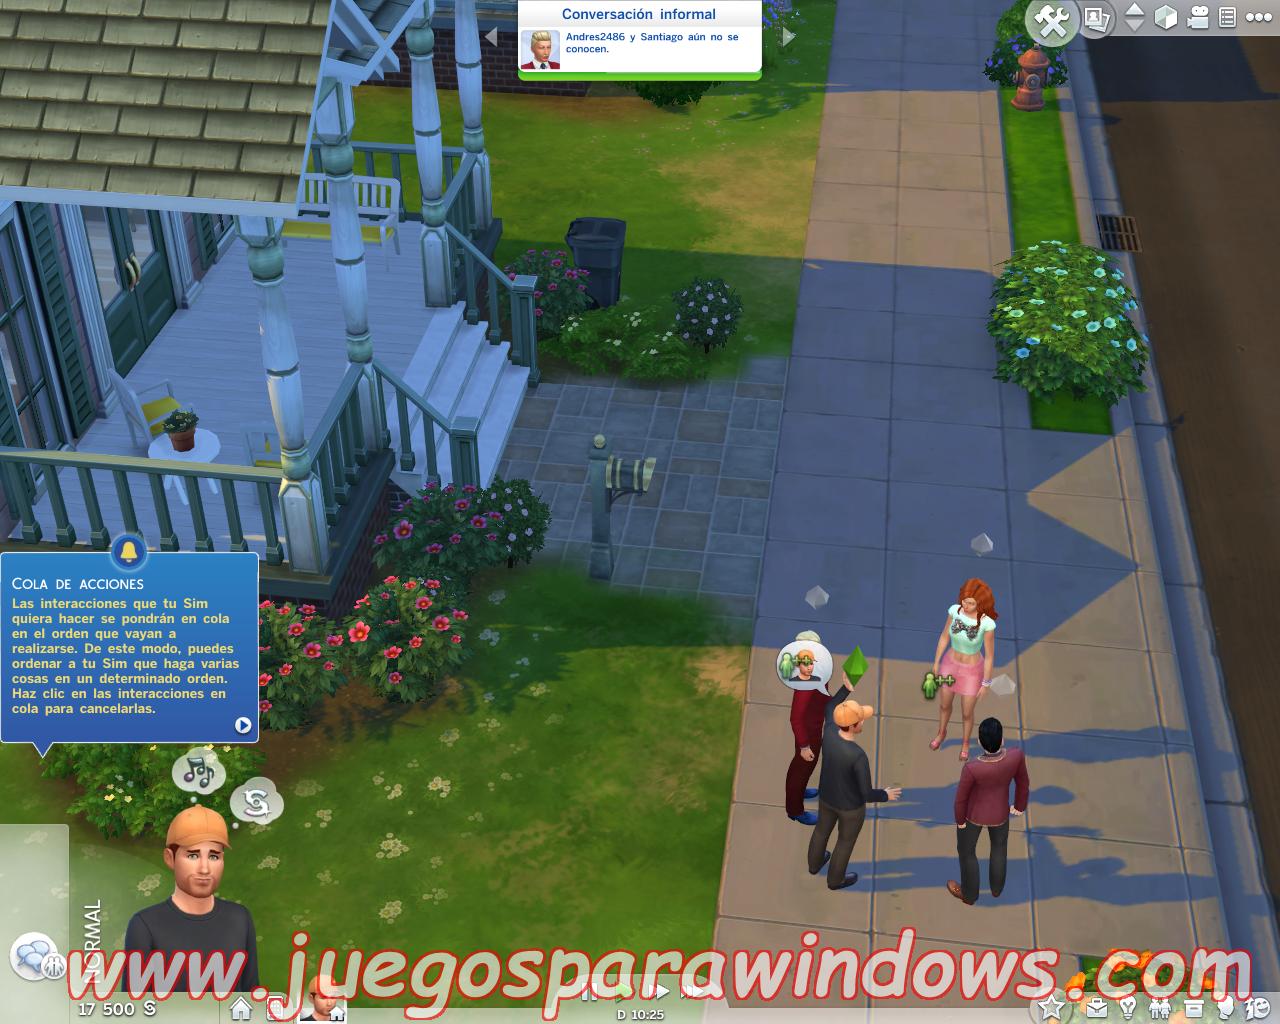 Sims 2 University Windows 7 Patch Free Download Programs